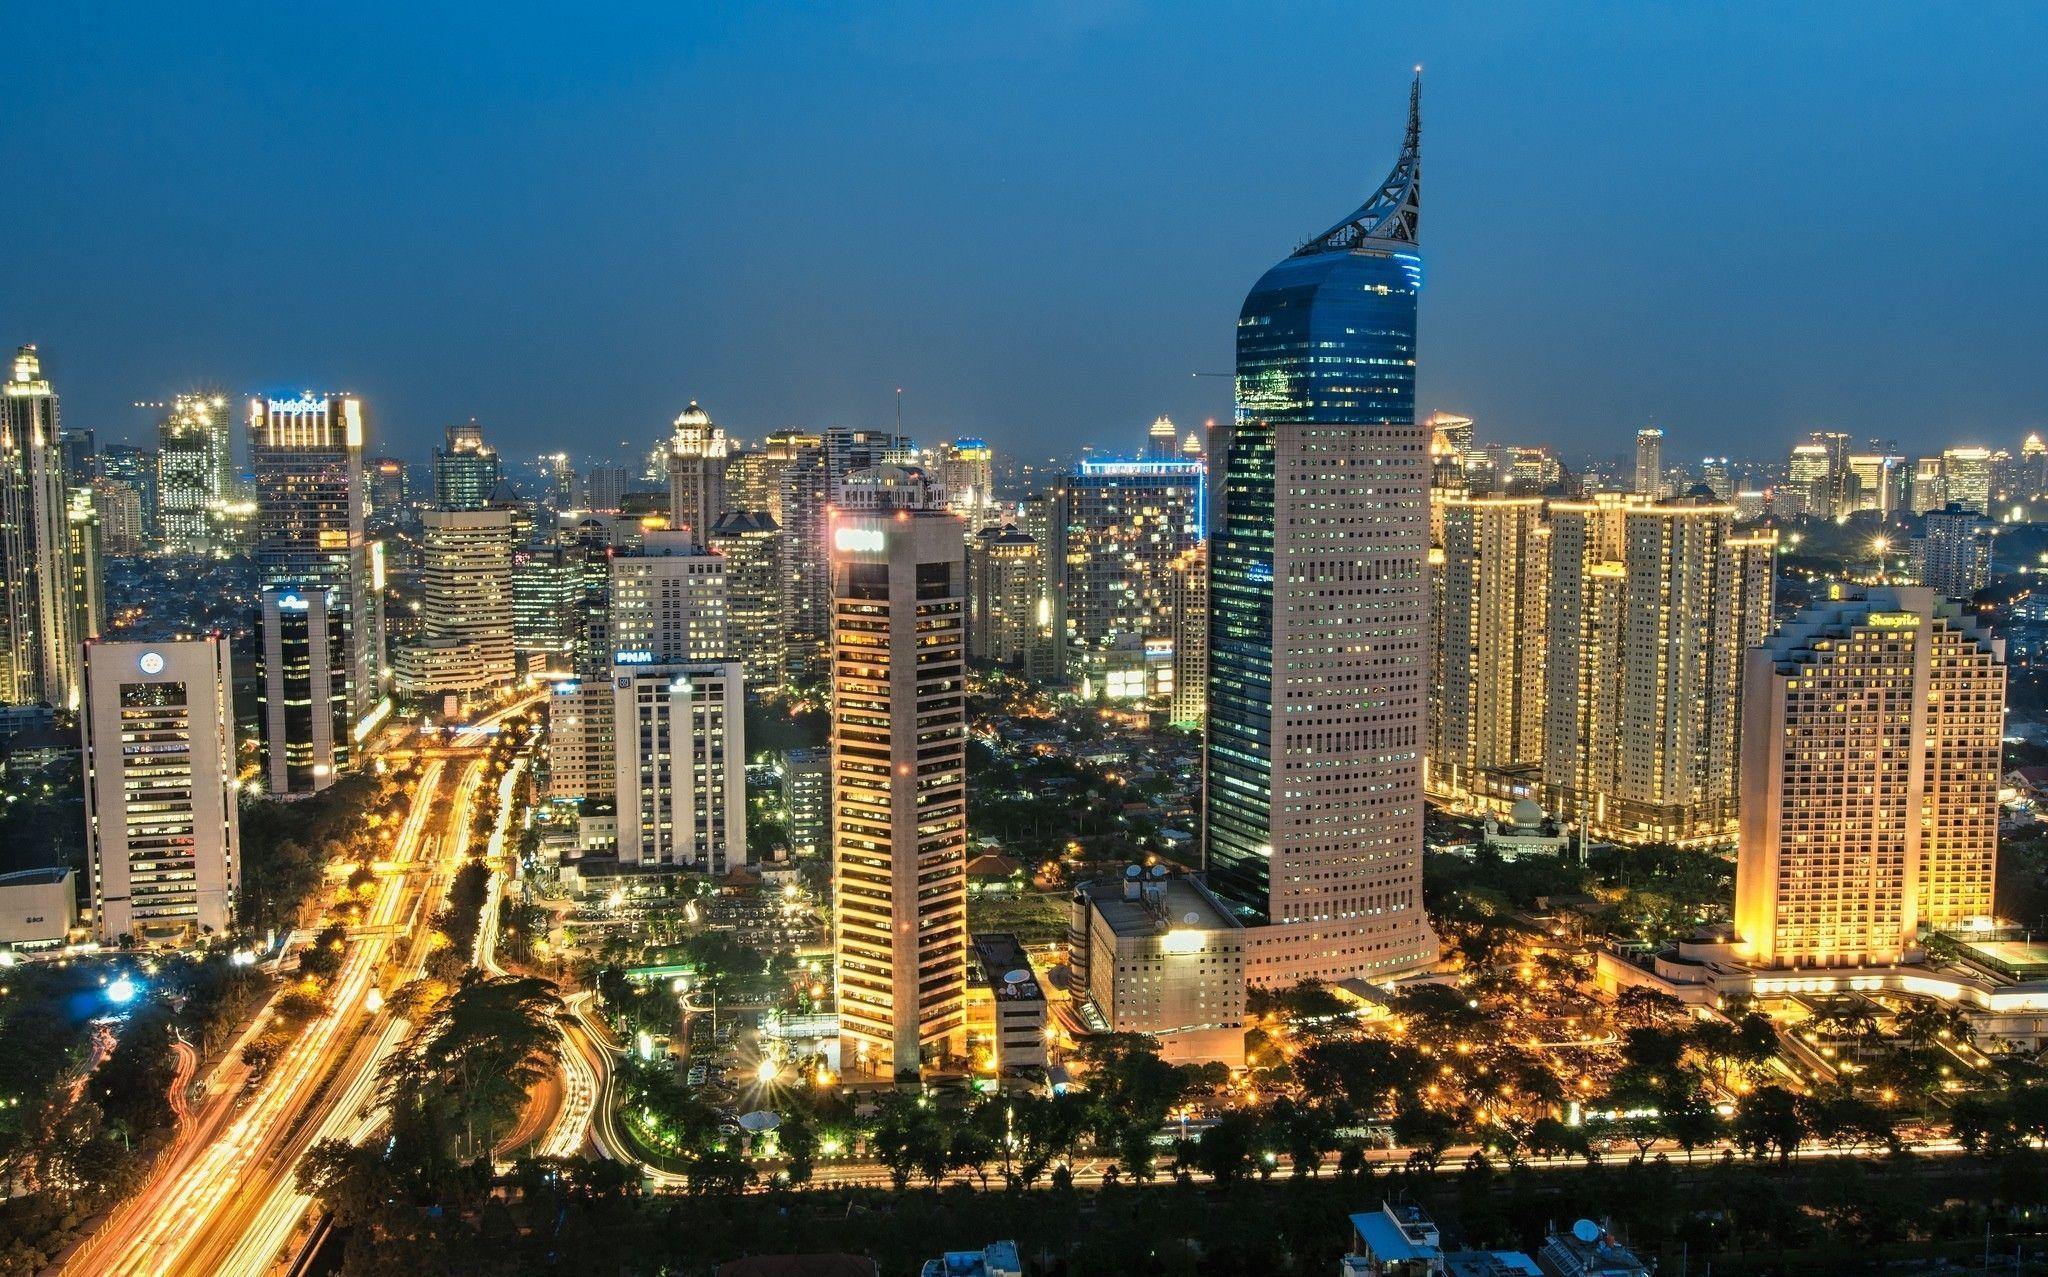 Jakarta Wallpapers   Top Free Jakarta Backgrounds   WallpaperAccess